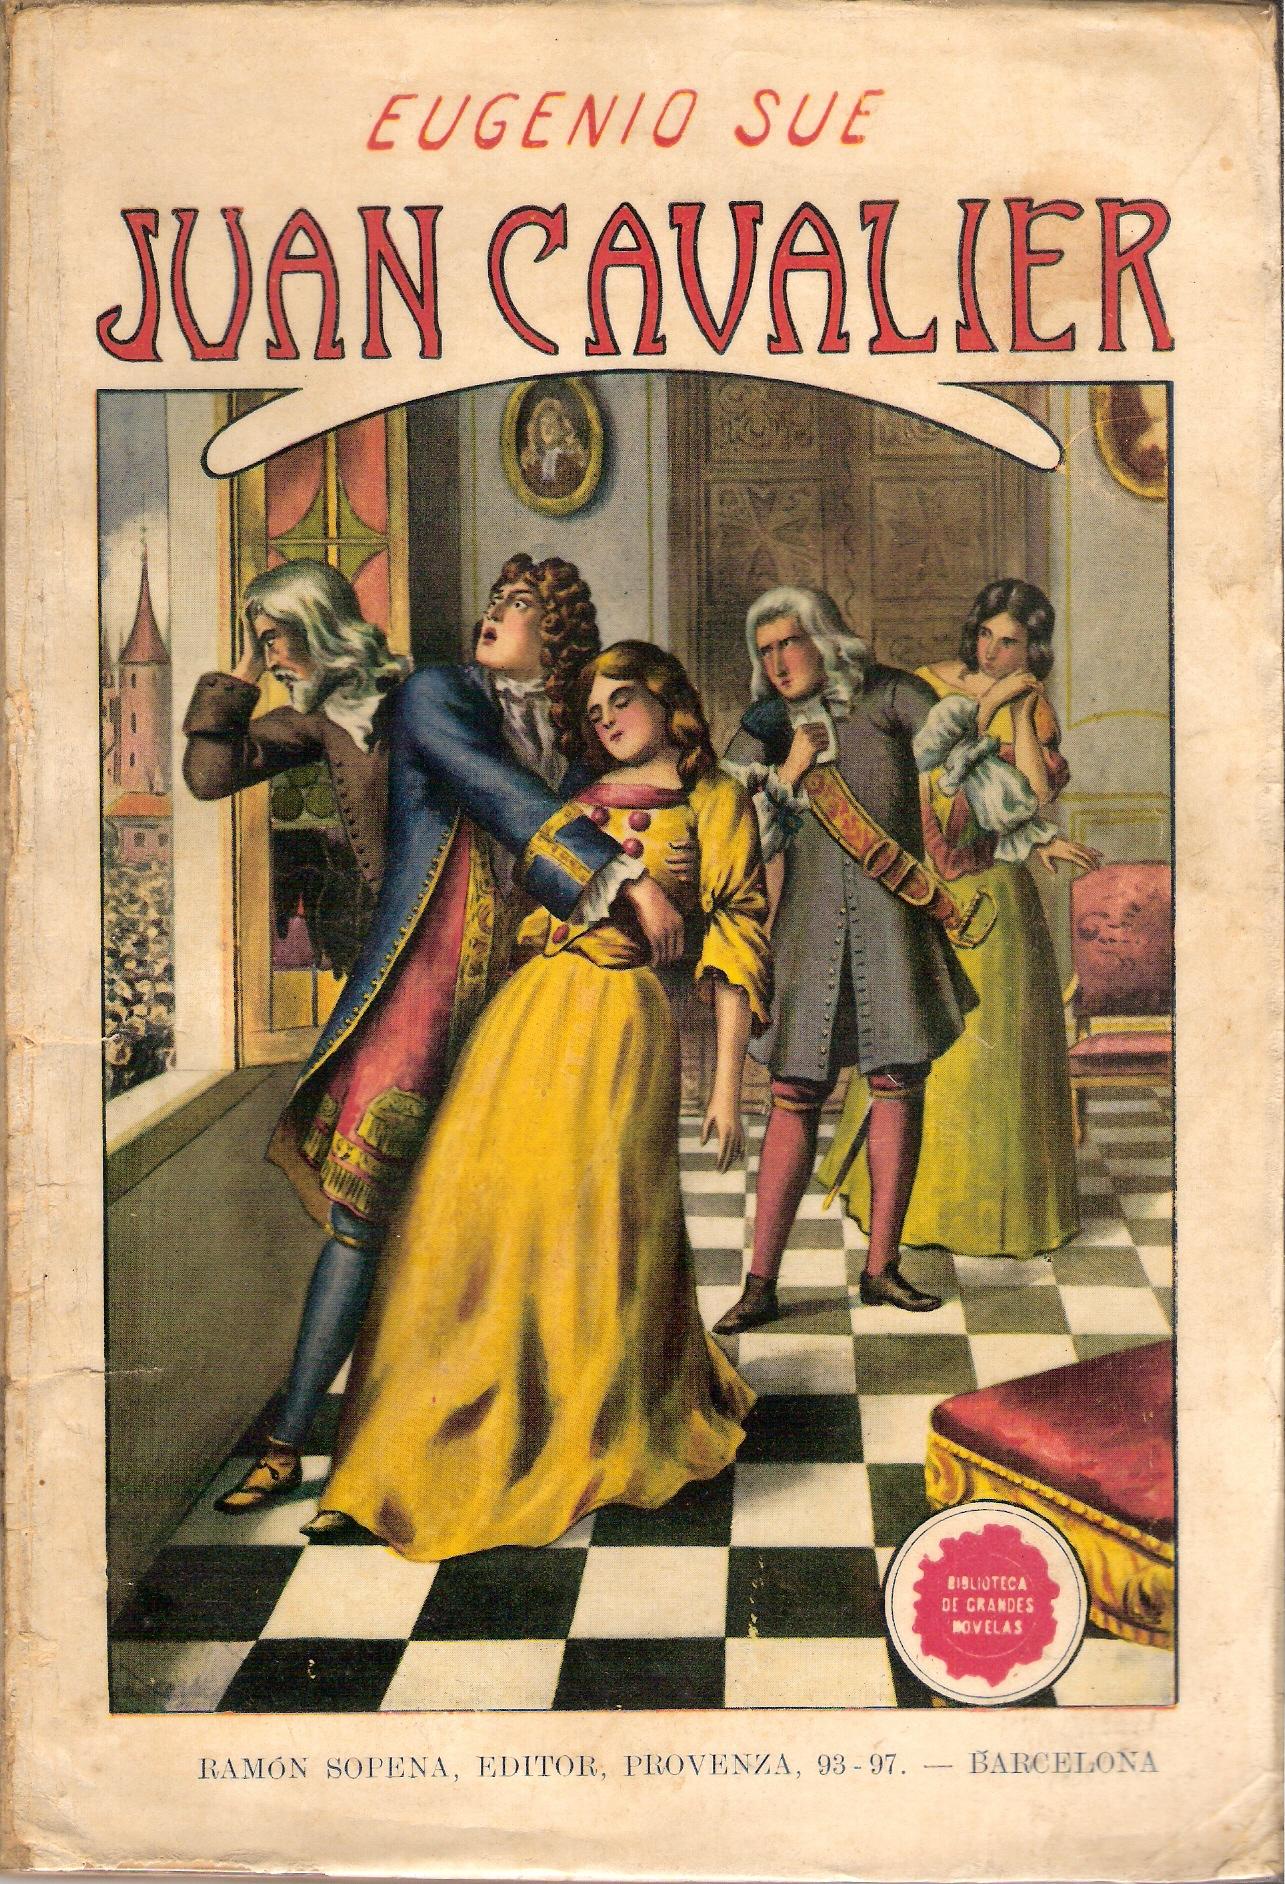 Juan Cavalier